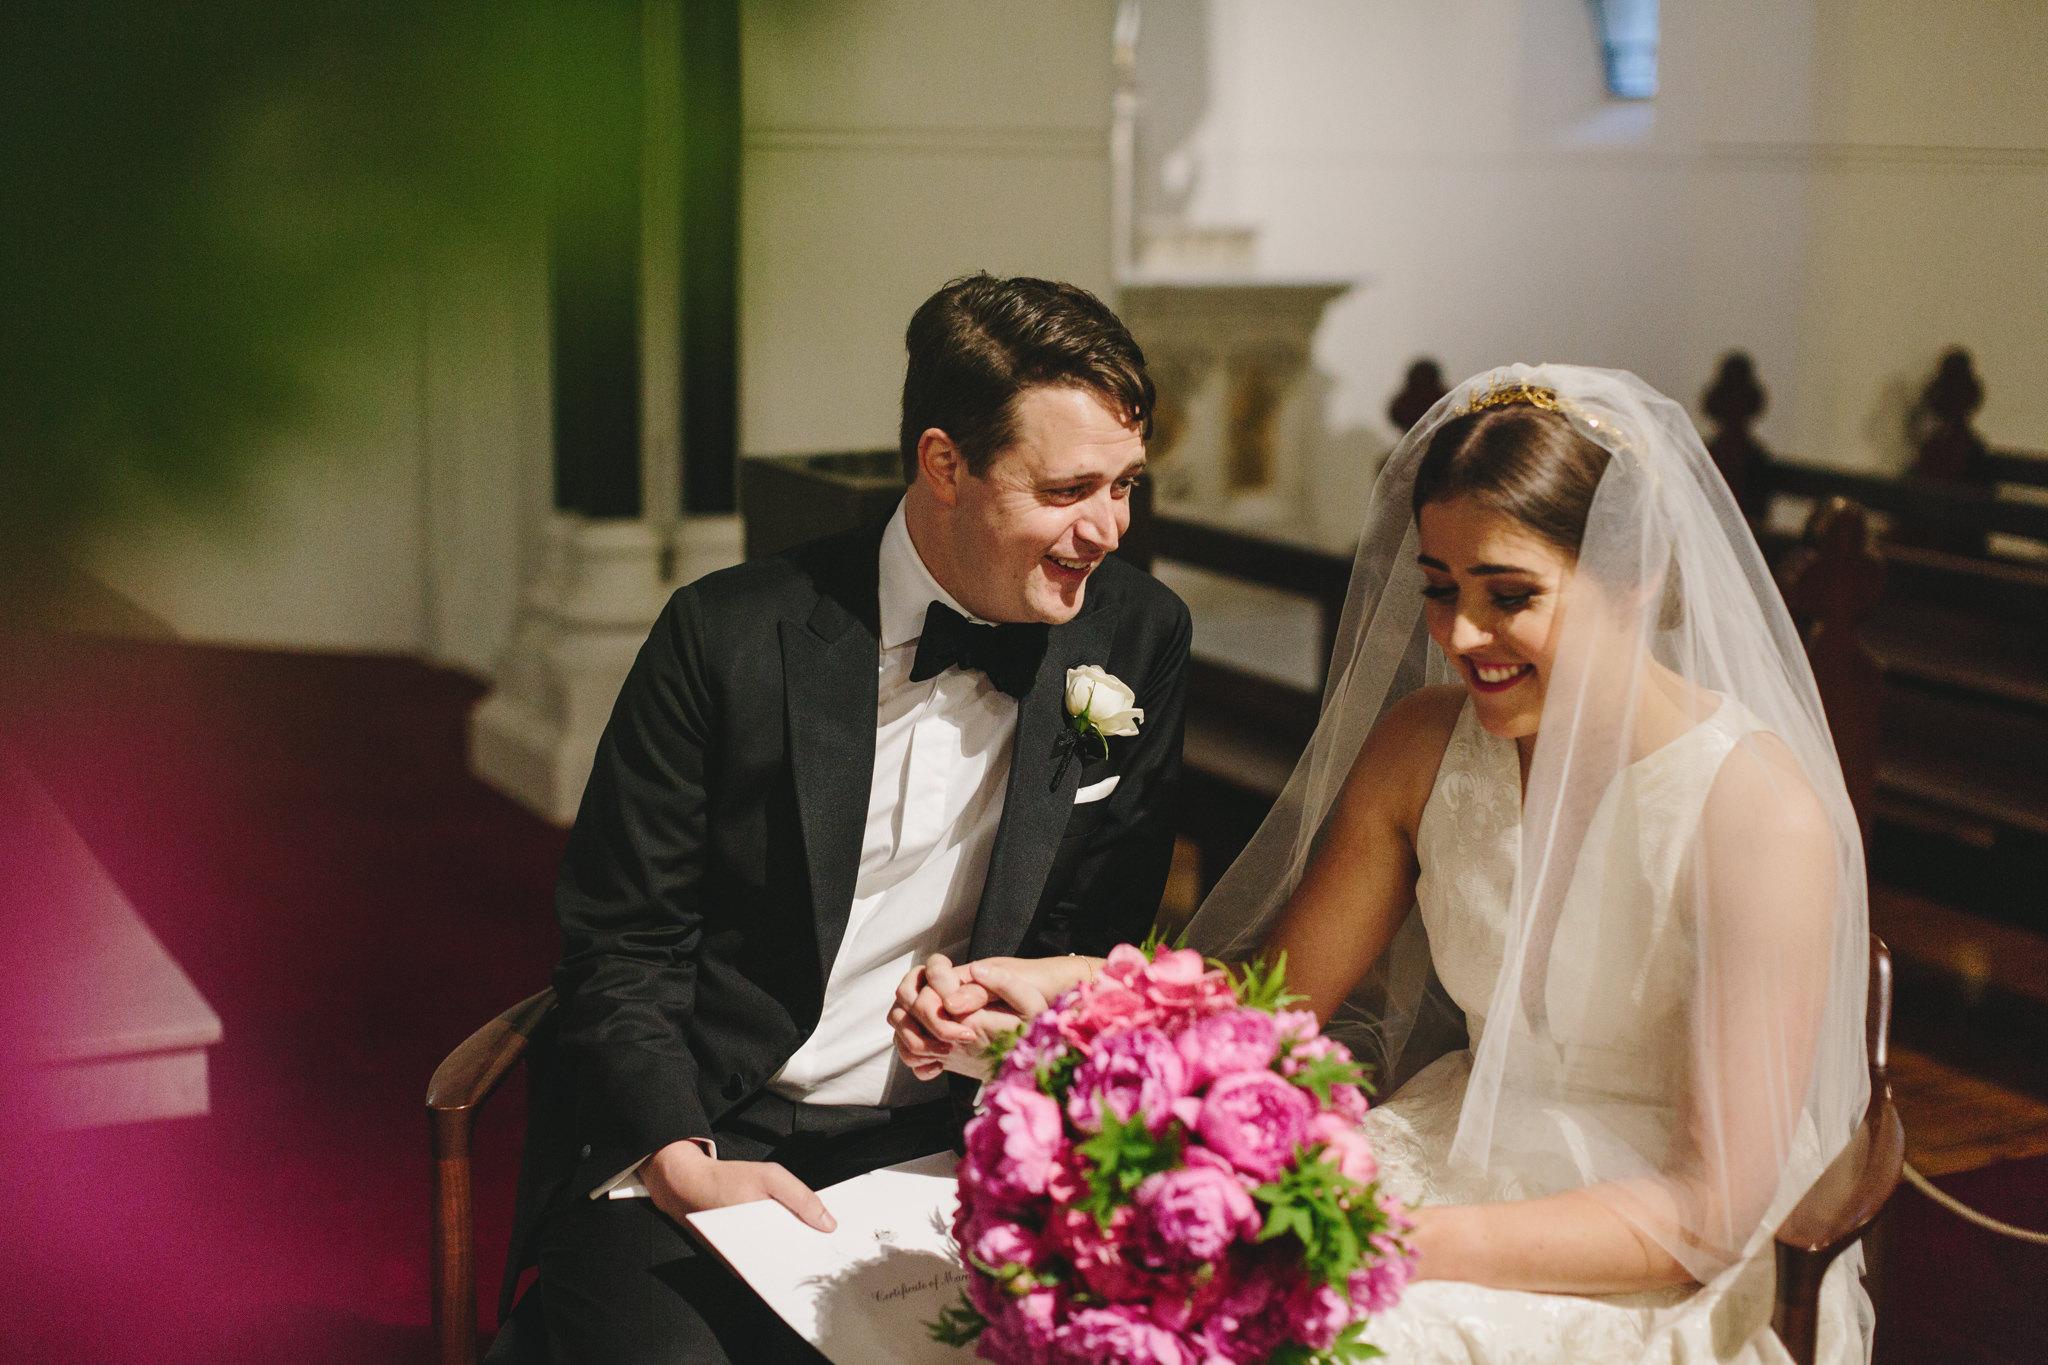 Abbotsford_Convent_Wedding_Peter_Anna068.JPG